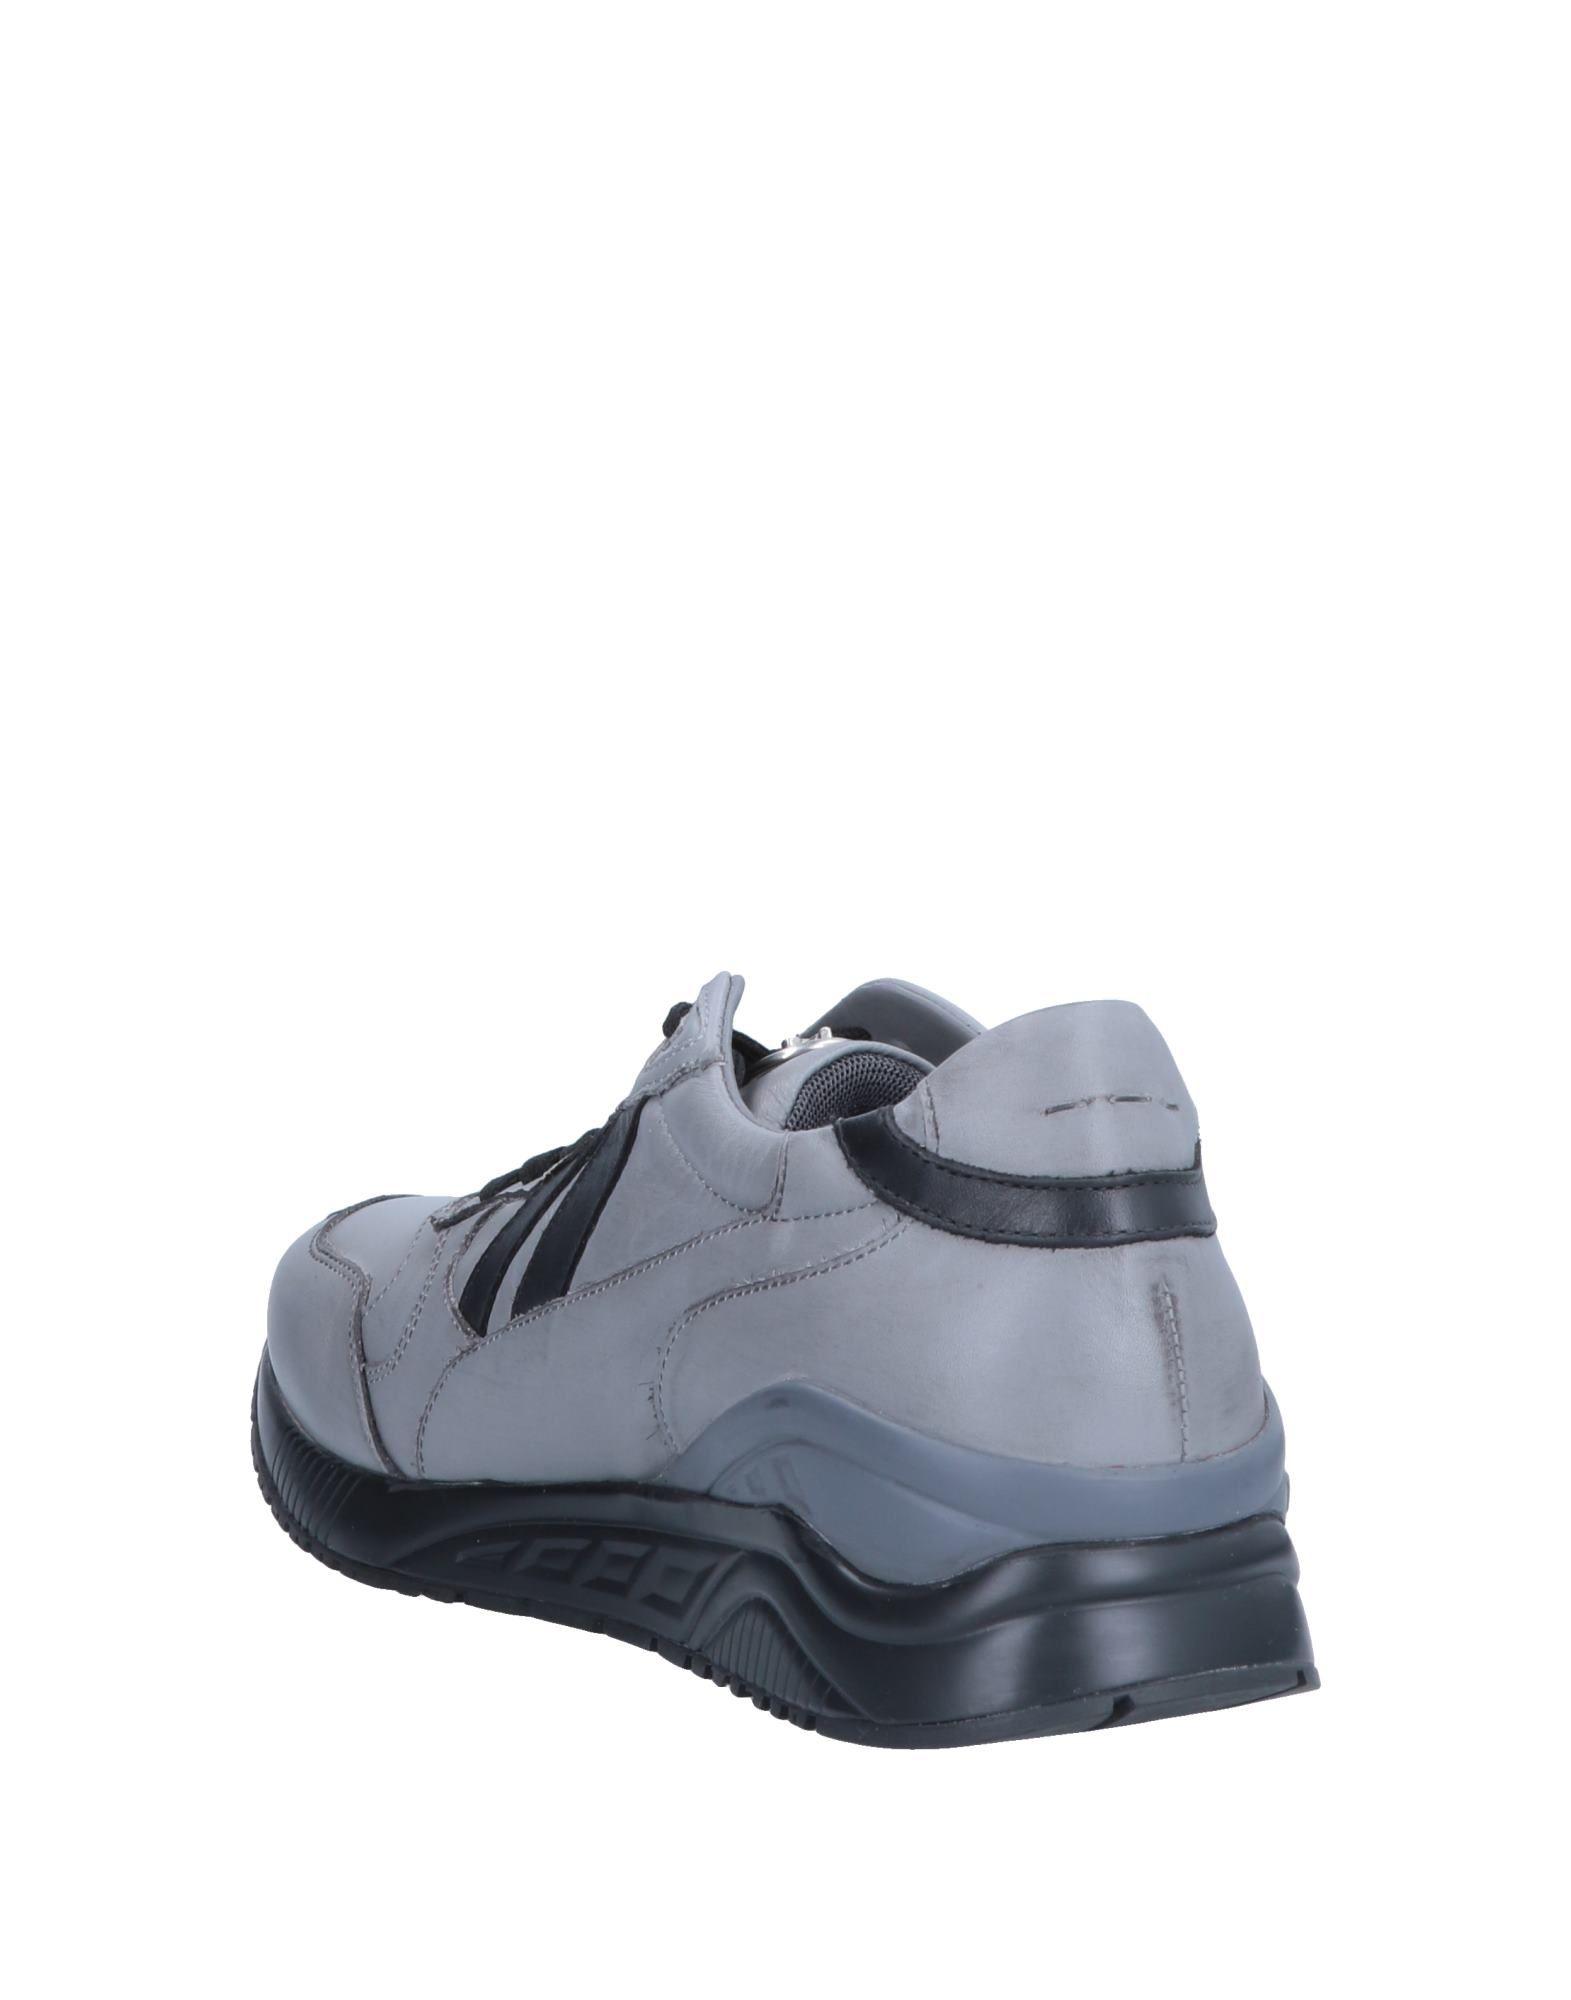 Cesare  Paciotti 4Us Sneakers Herren  Cesare 11557453PK Gute Qualität beliebte Schuhe 5ee50f